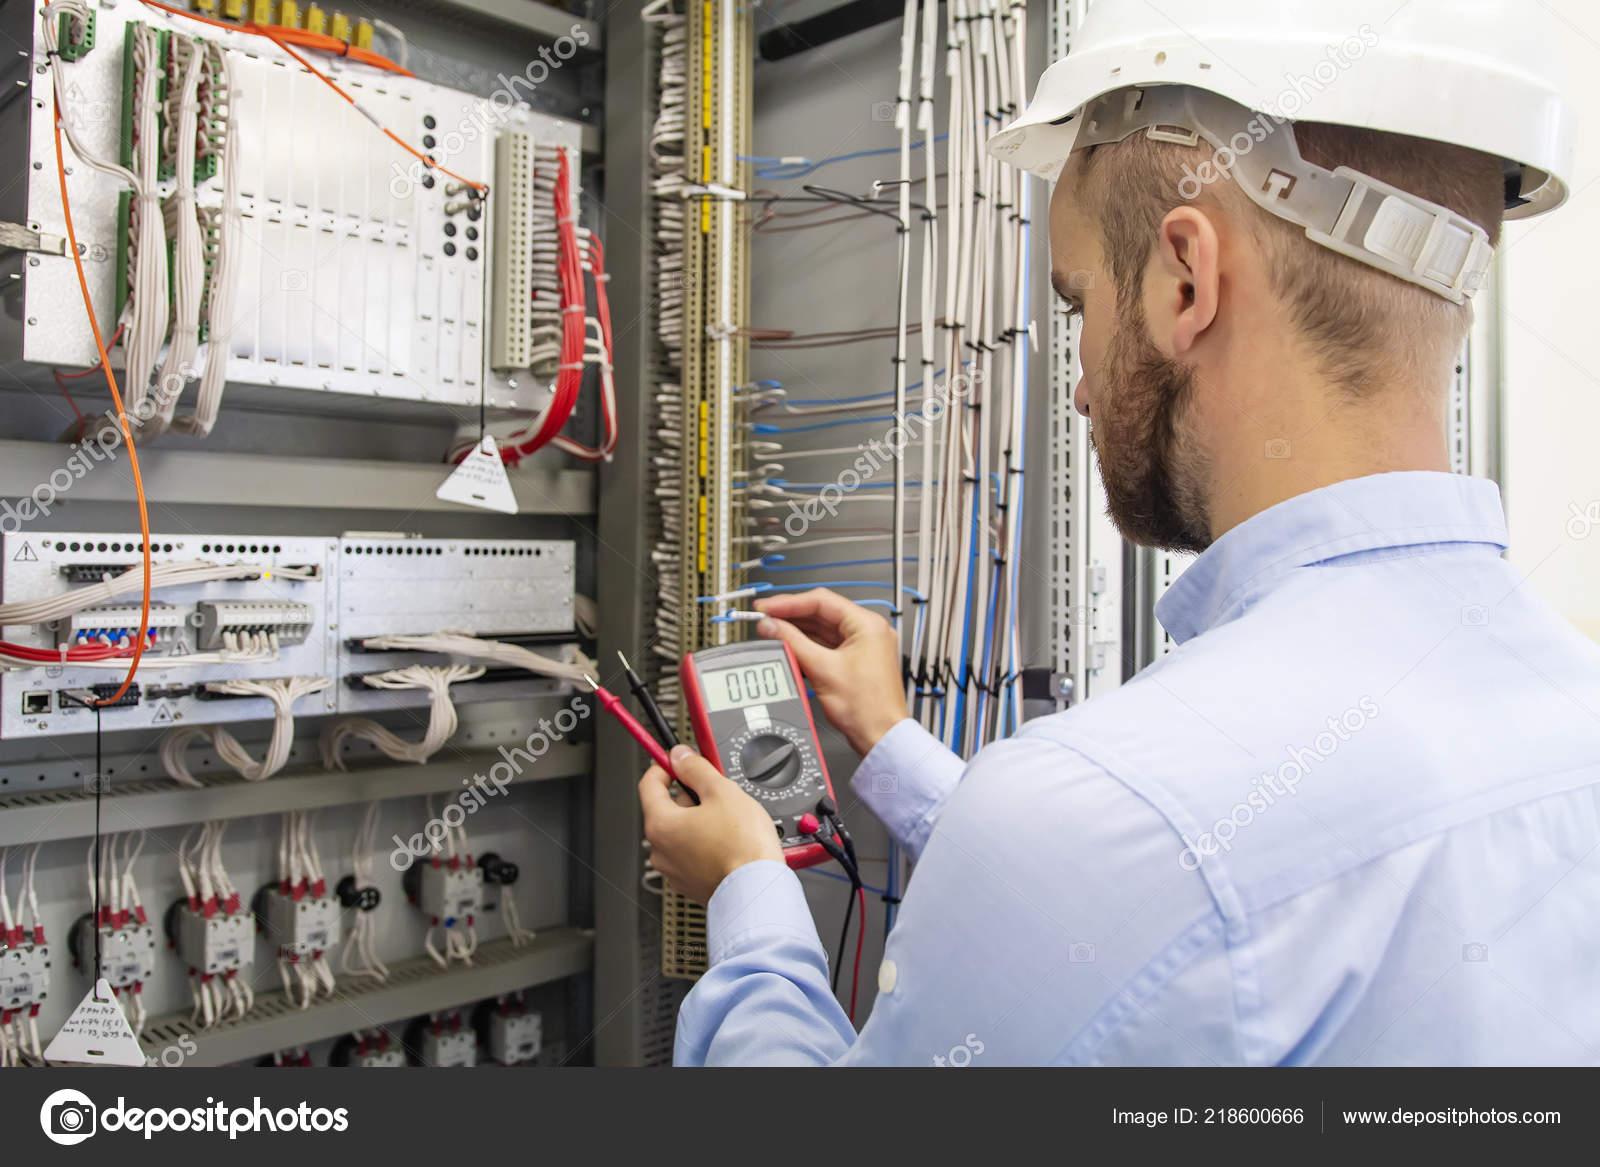 electrician technician in fuse box. maintenance engineer in ...  depositphotos